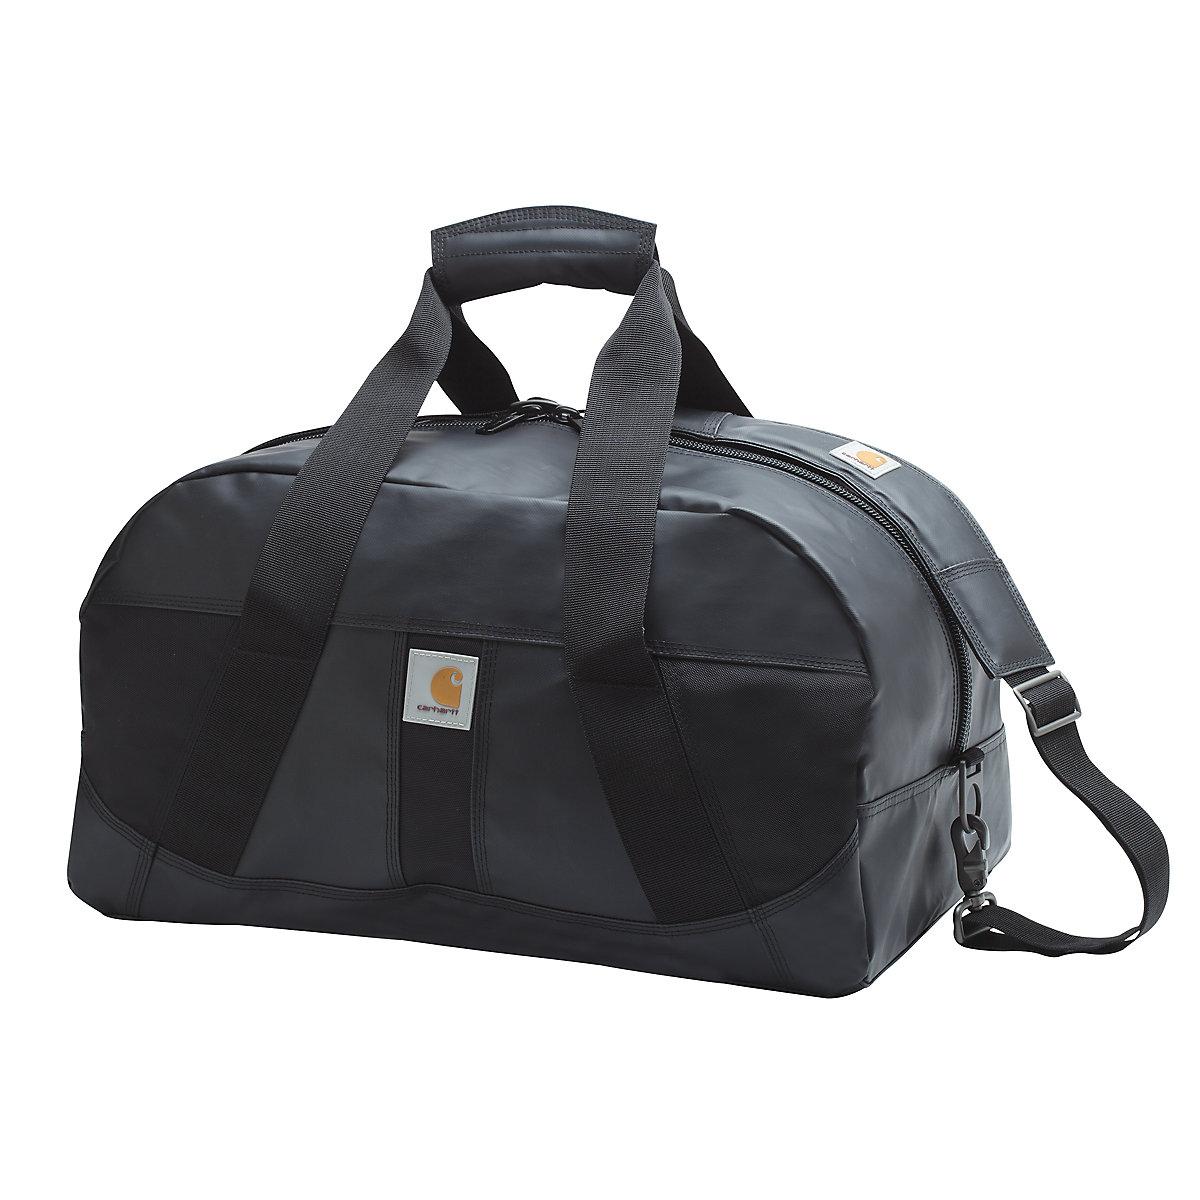 fad01f3464c2 Big Dome Gym Bag